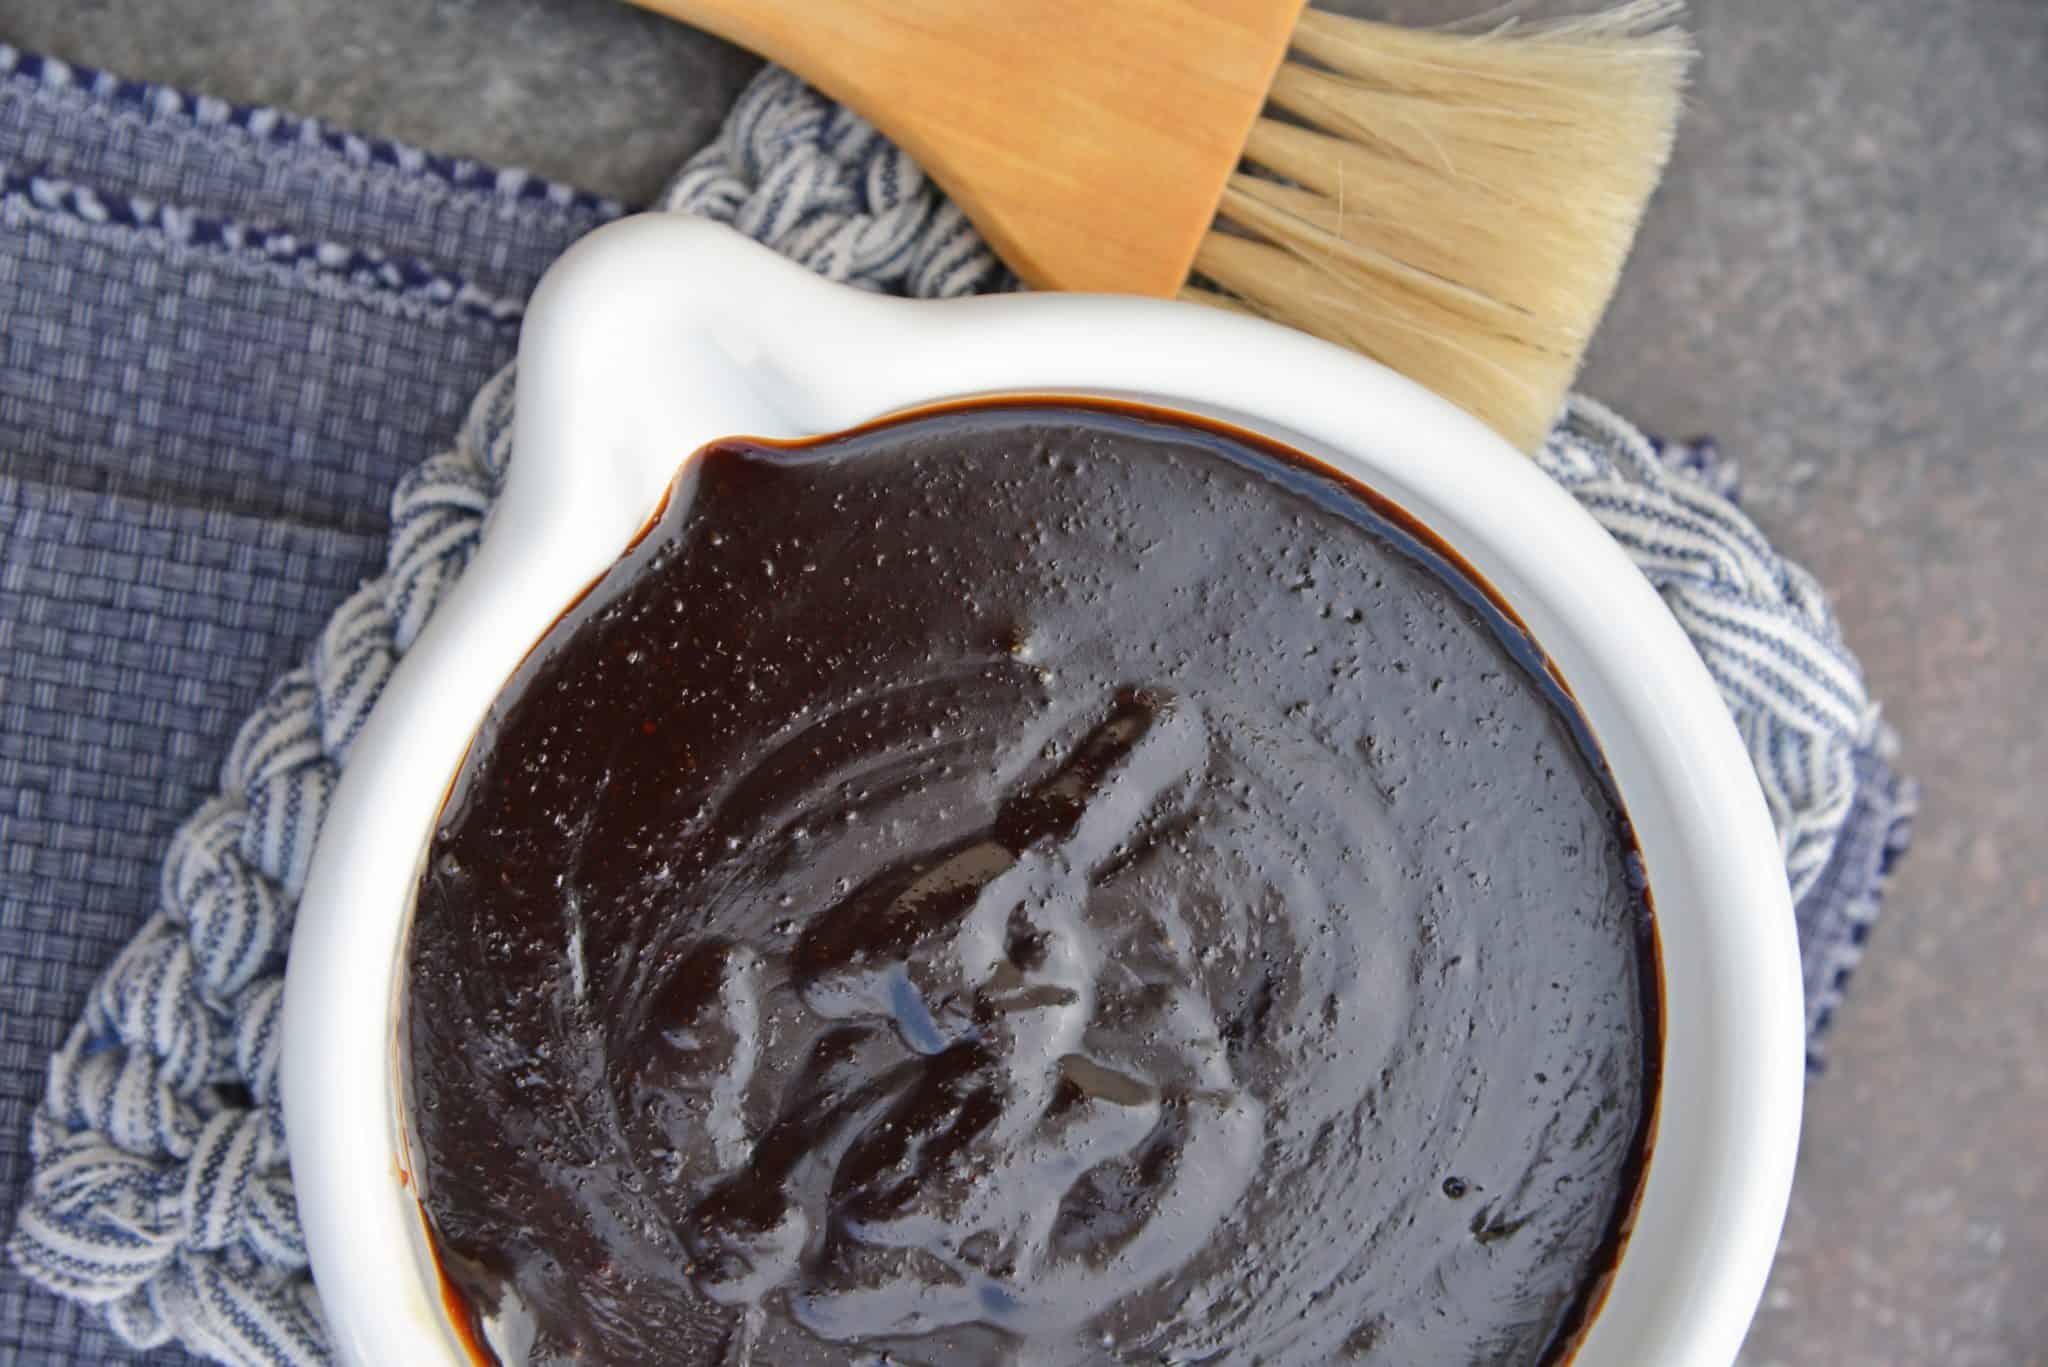 Teriyaki Sauce can be made into an easy teriyaki marinade or glaze. Perfect for teriyaki chicken, easy stir fry recipe or even making homemade beef jerky. #teriyakisauce #chickenteriyaki www.savoryexperiments.com